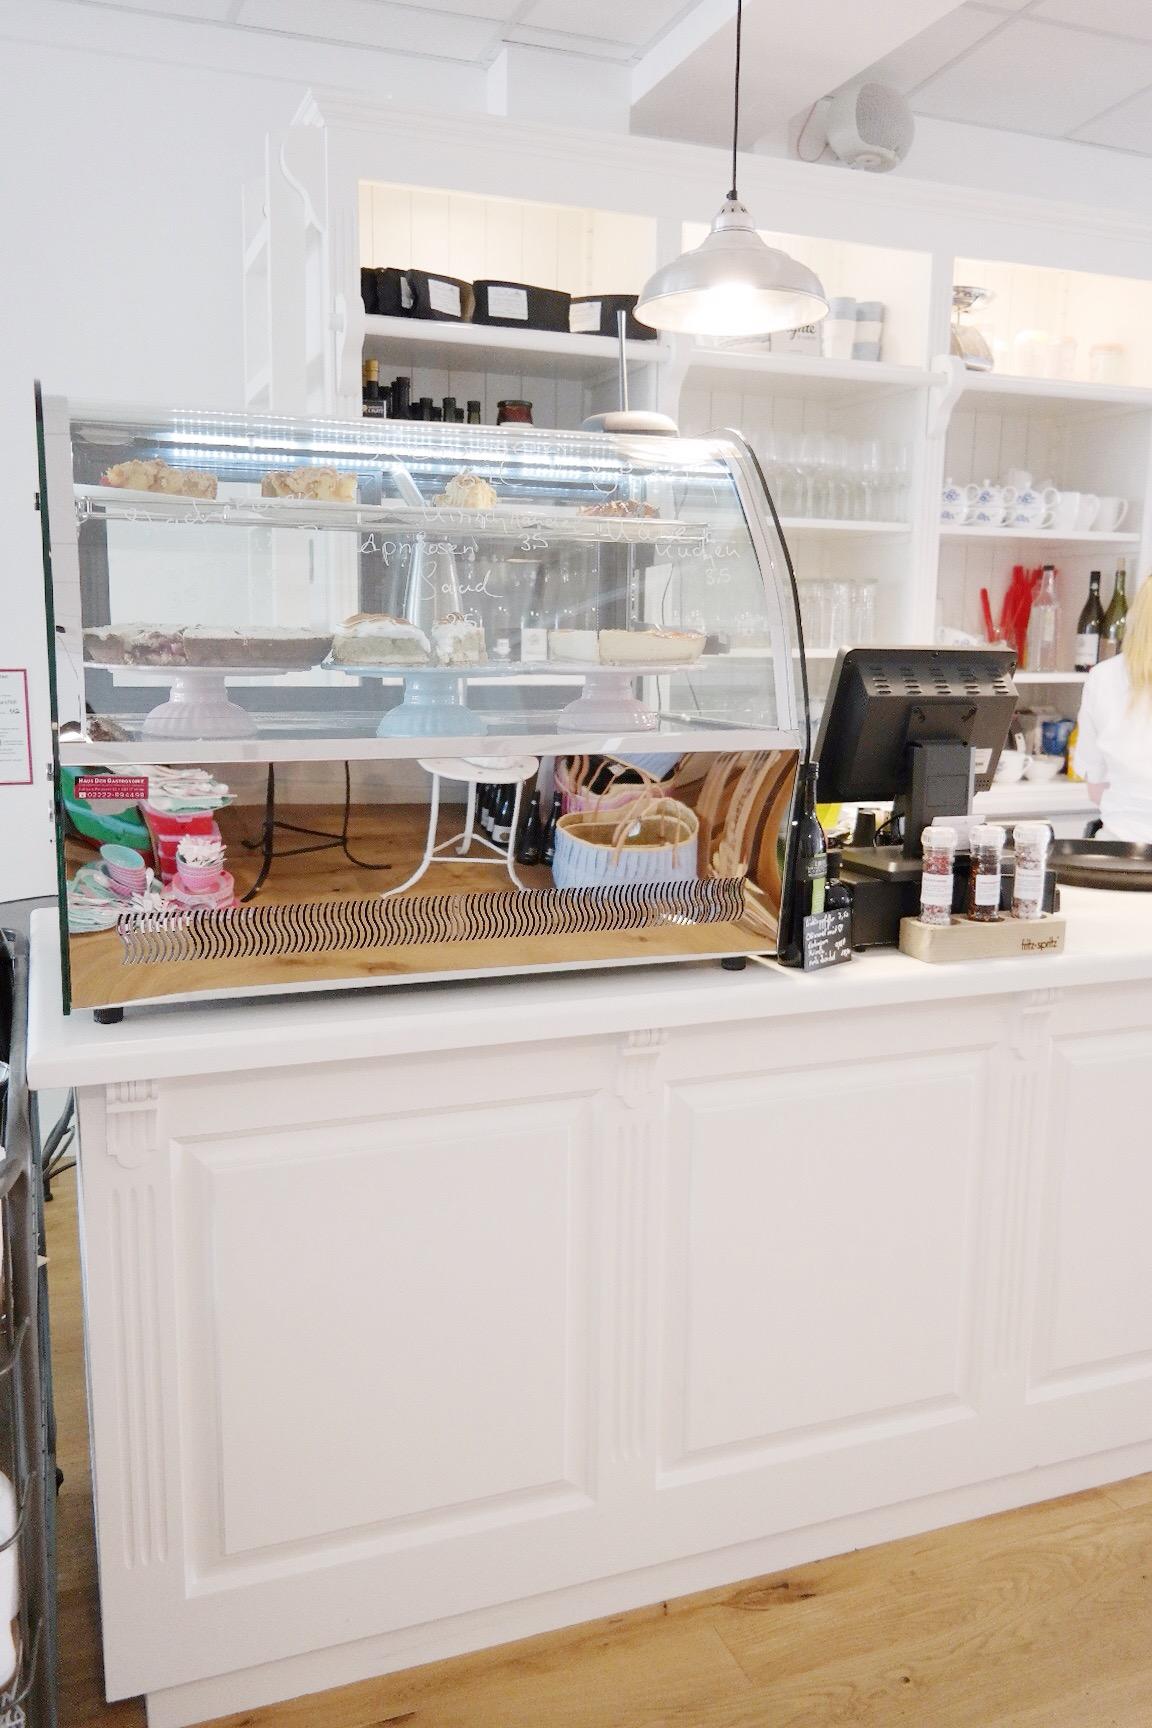 Karlottas Bad honnef lieblingskram cafe kuchenessen bonn missbonnebonne (1)